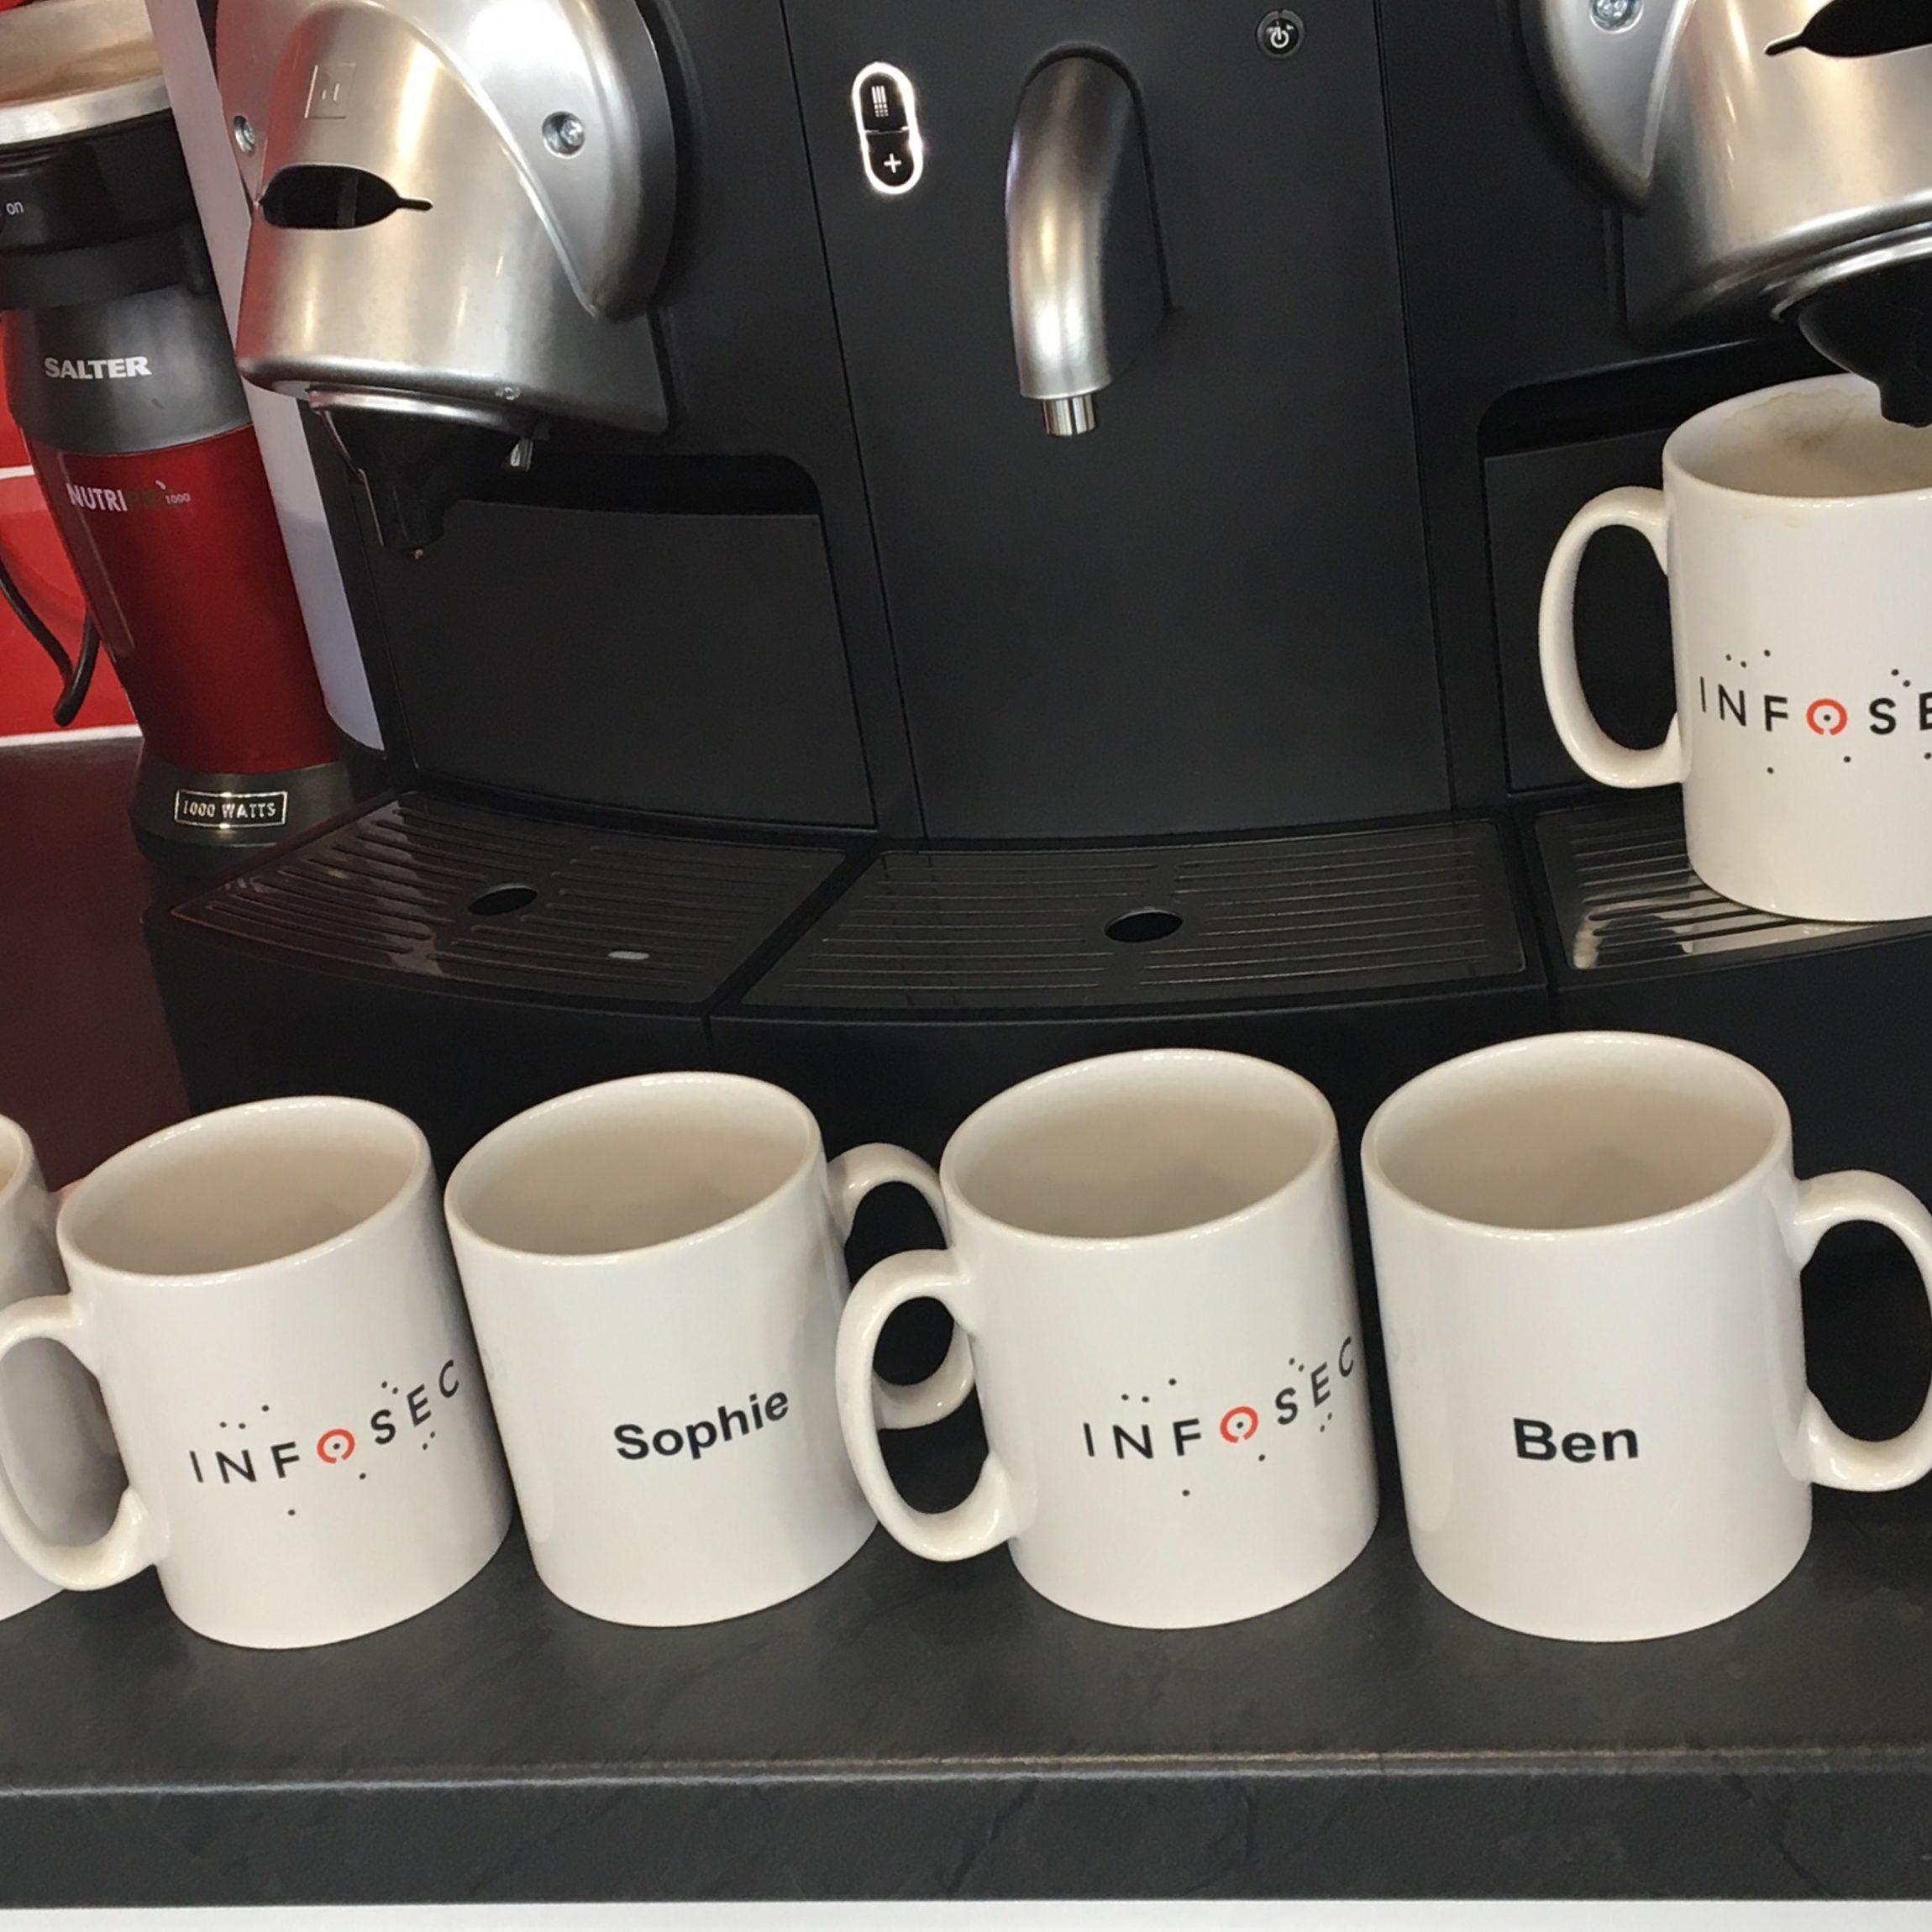 Branded mugs printed with company logo